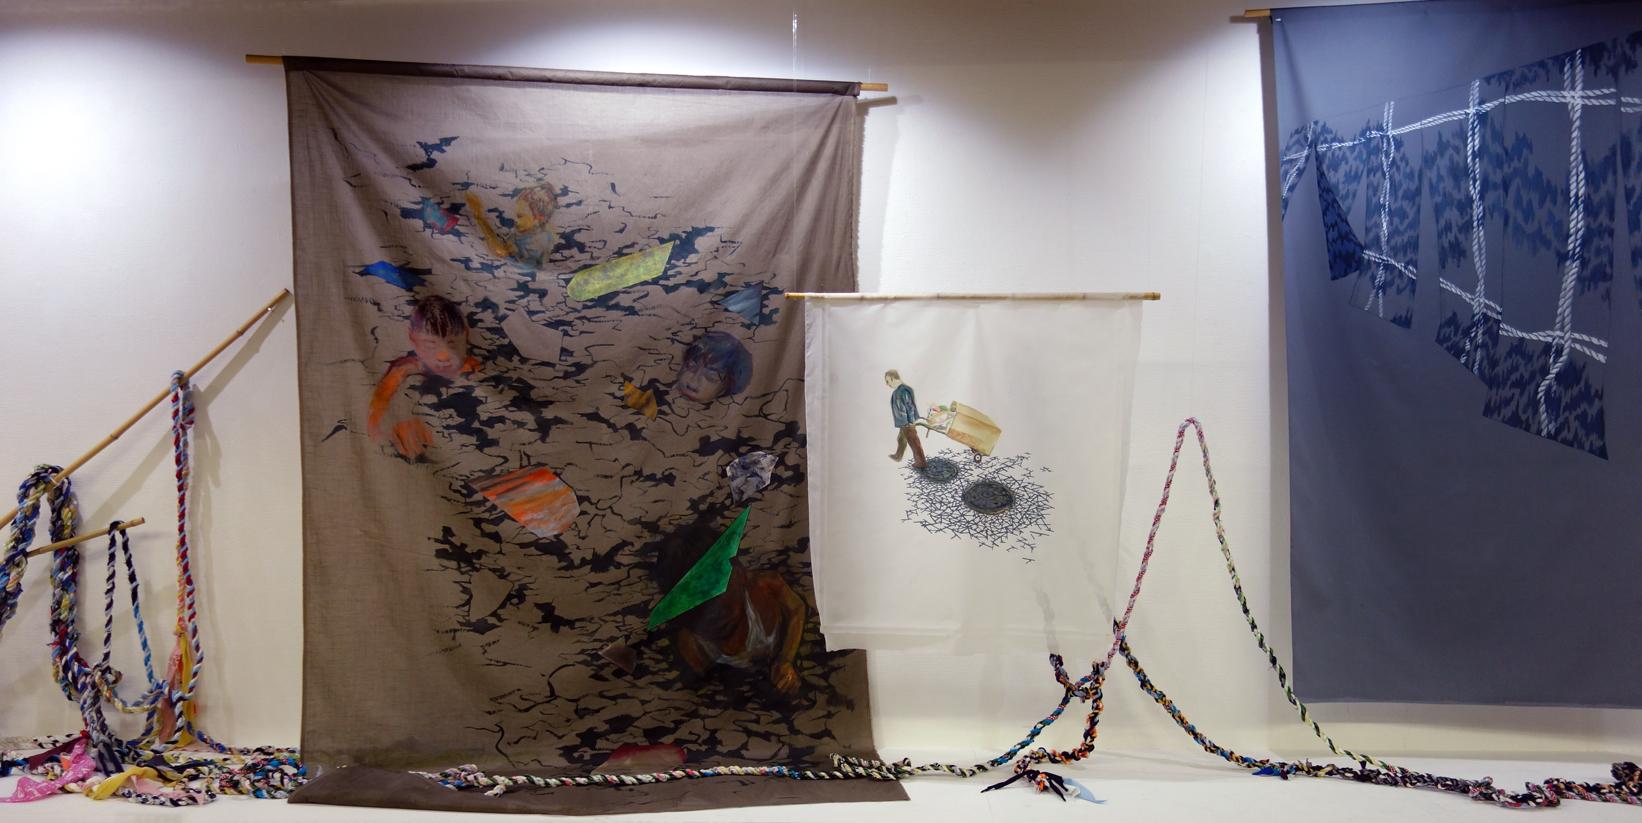 kaori-nakajima__sister-city-brother-project-munchen-ミュンヘンの現代の抽象_11.jpg